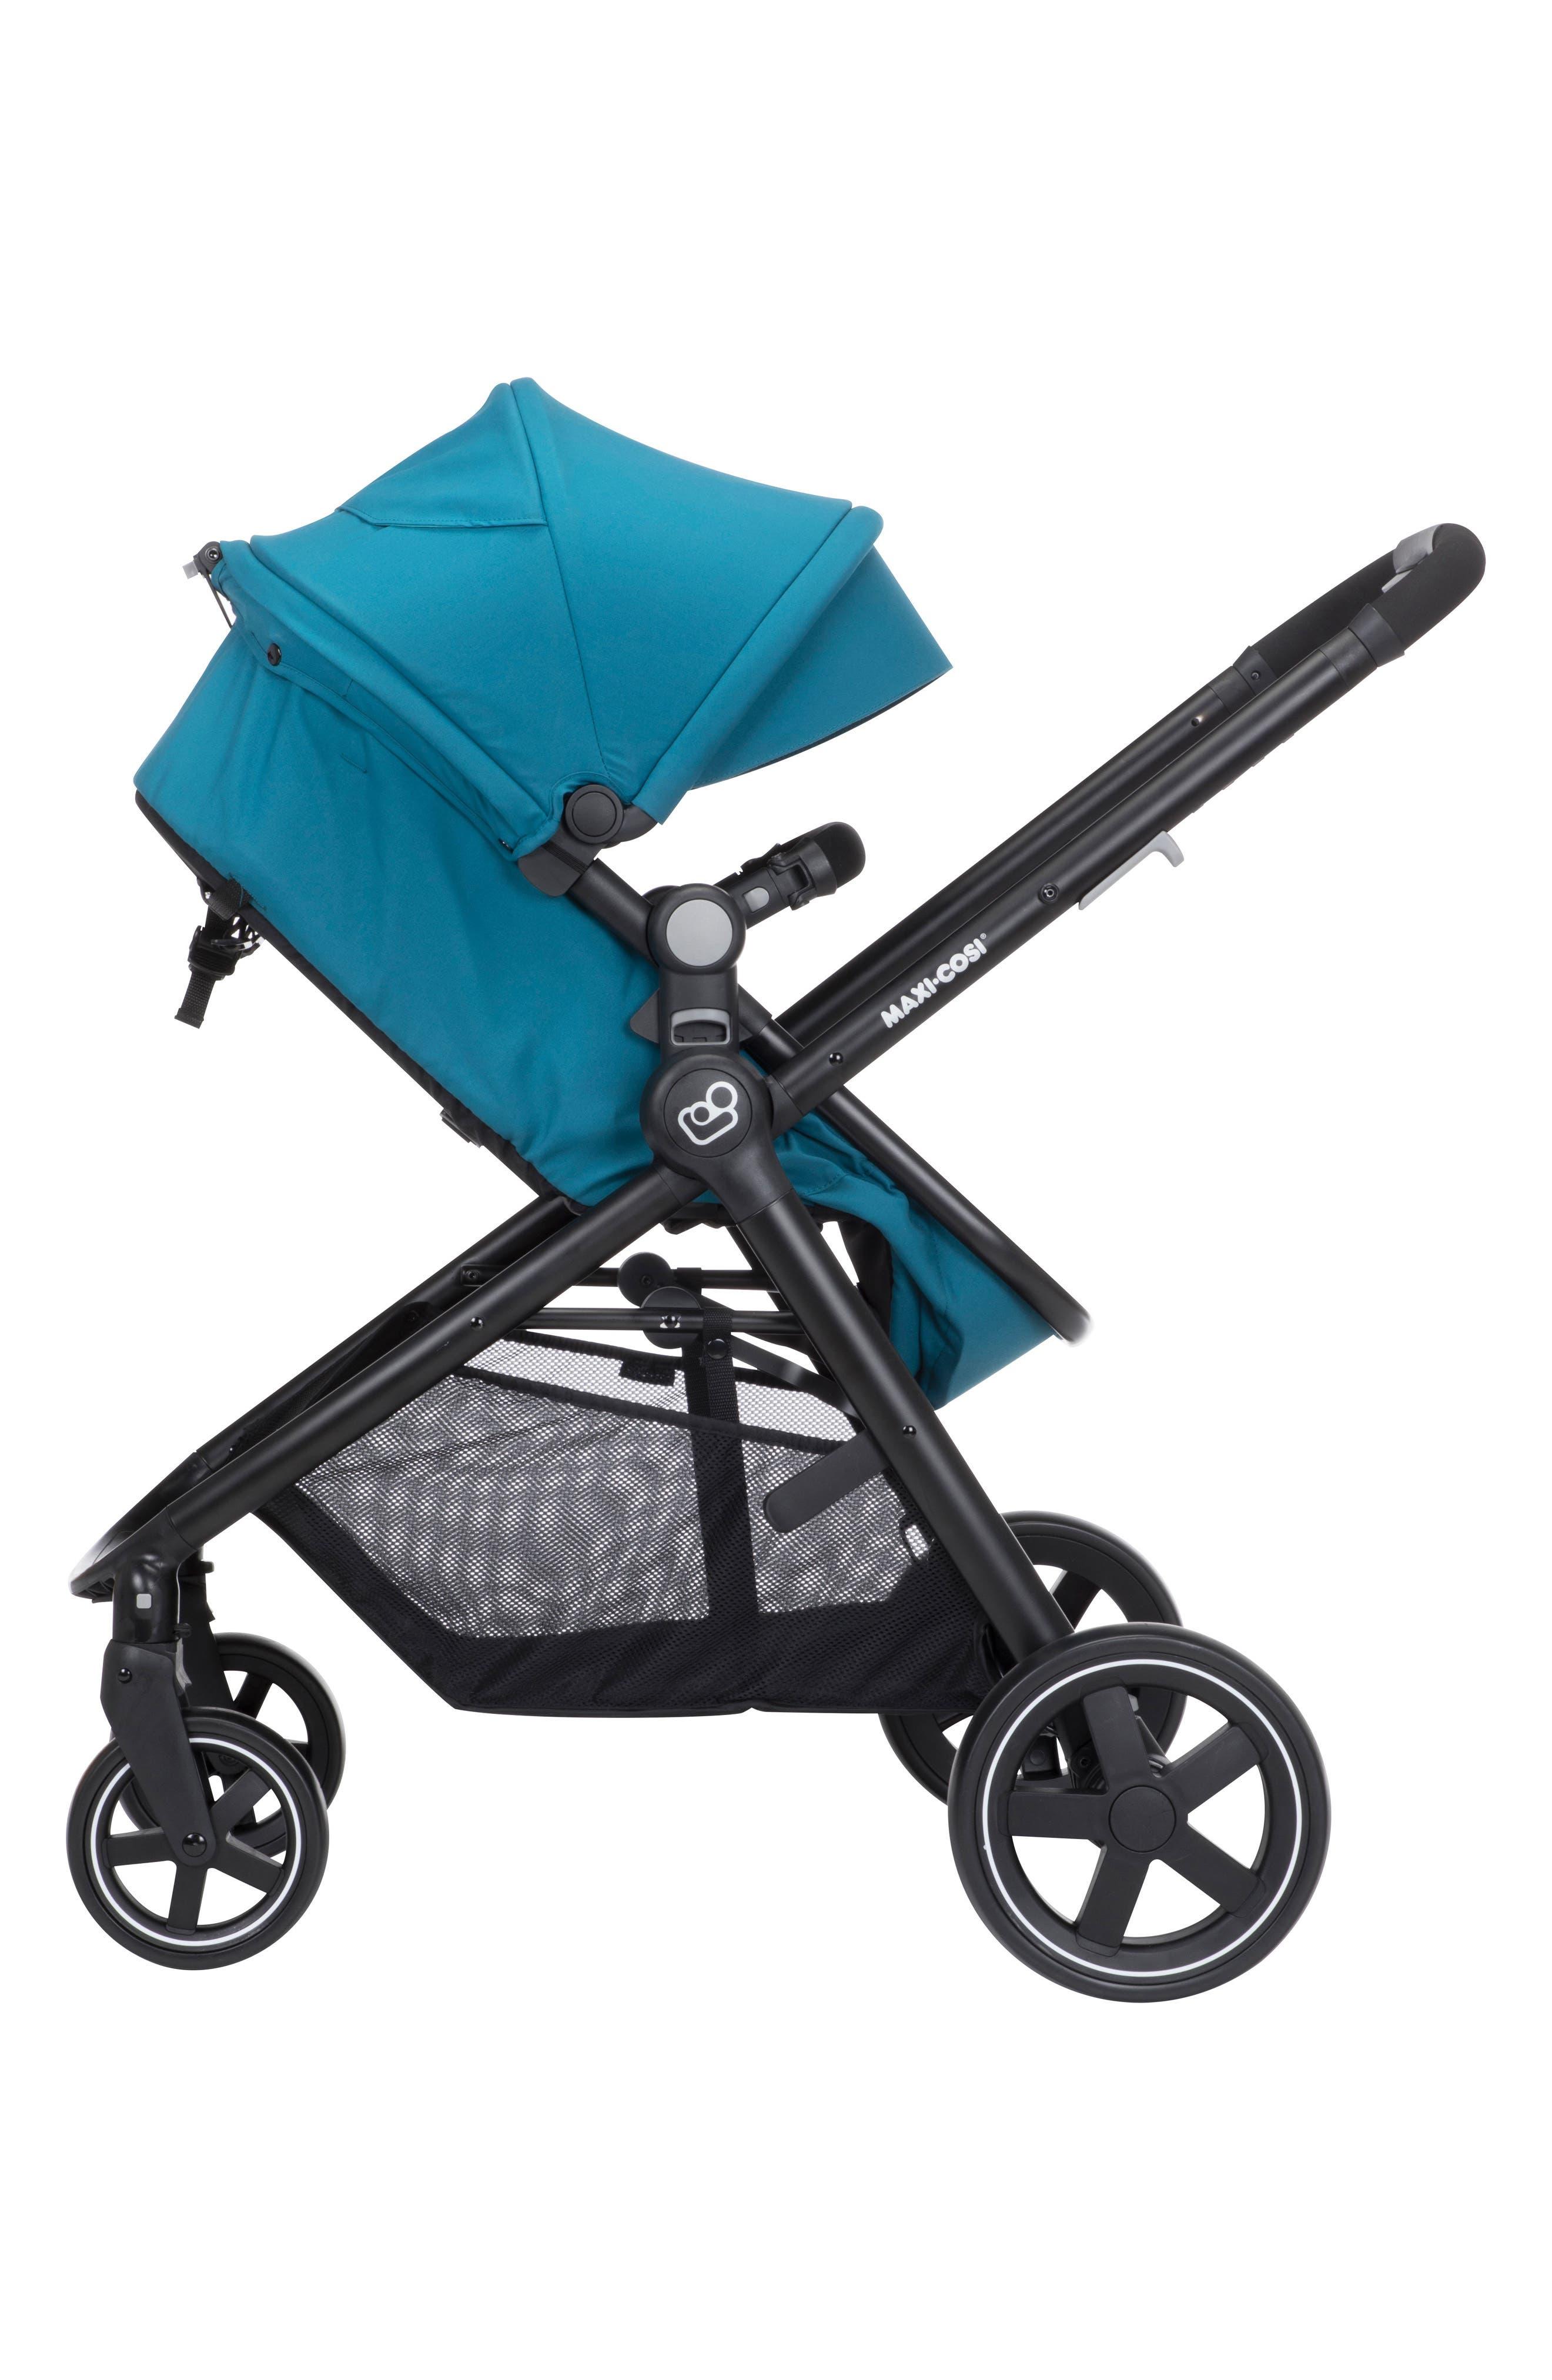 5-1 Mico 30 Infant Car Seat & Zelia Stroller Modular Travel System,                             Alternate thumbnail 8, color,                             EMERALD TIDE